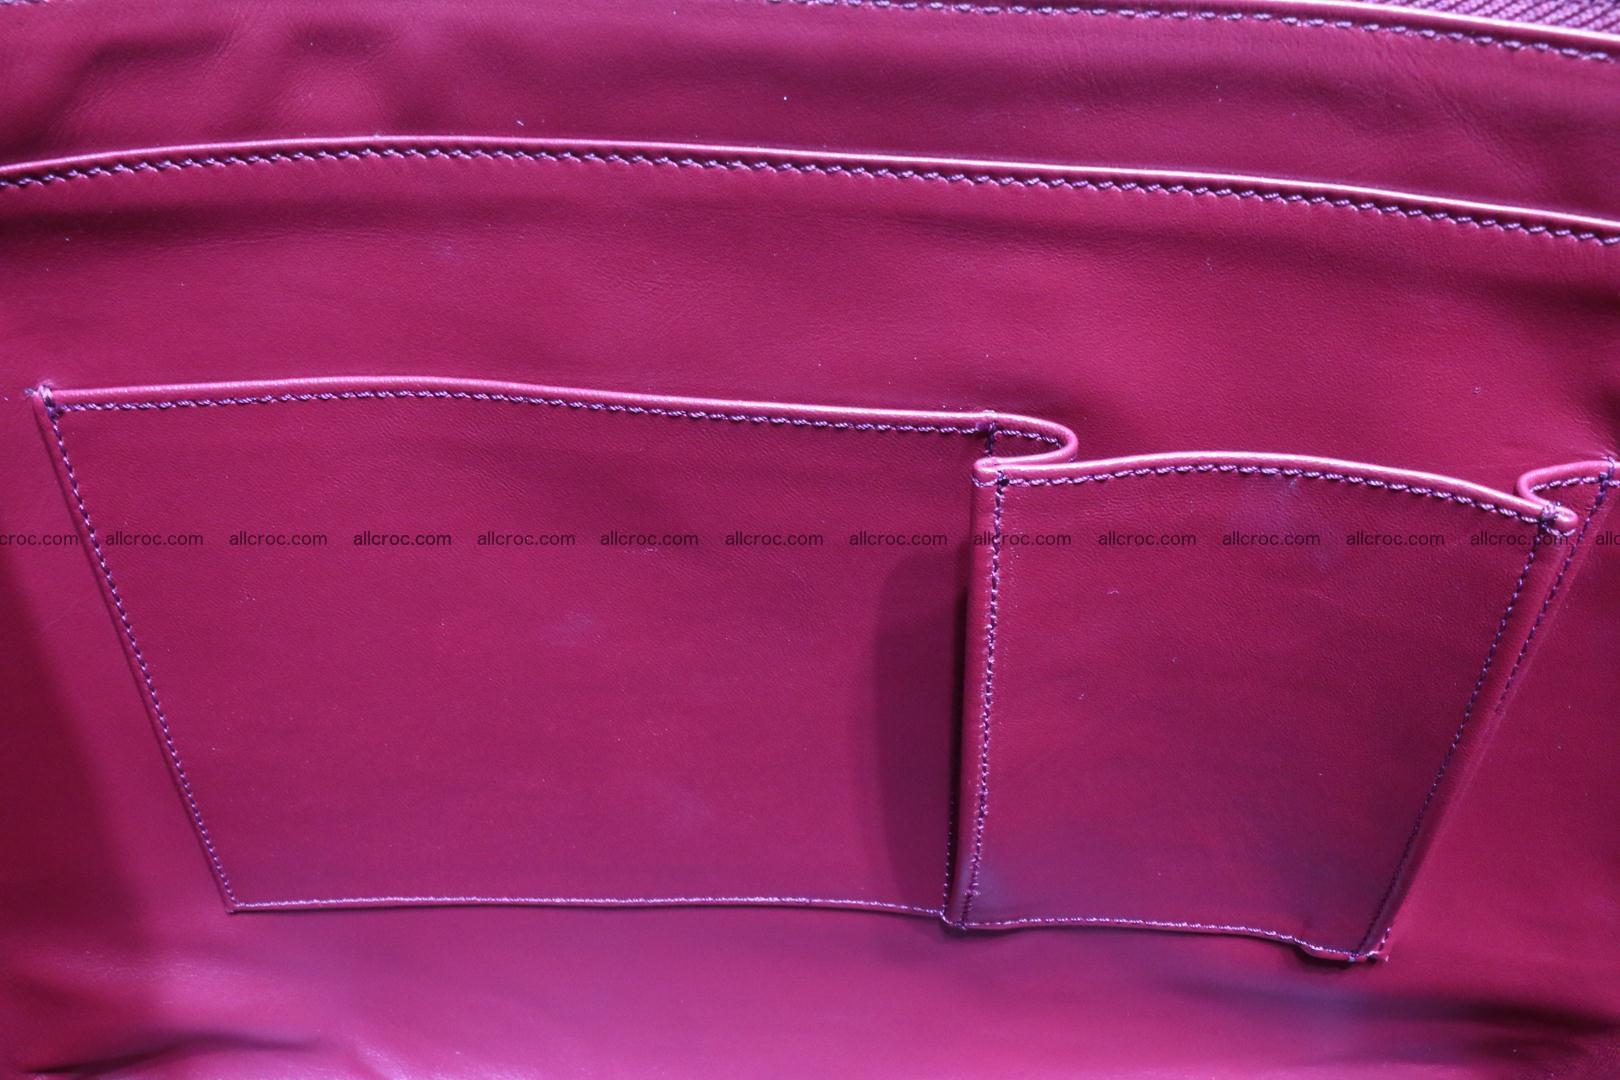 Genuine crocodile leather women's bag 063 Foto 14